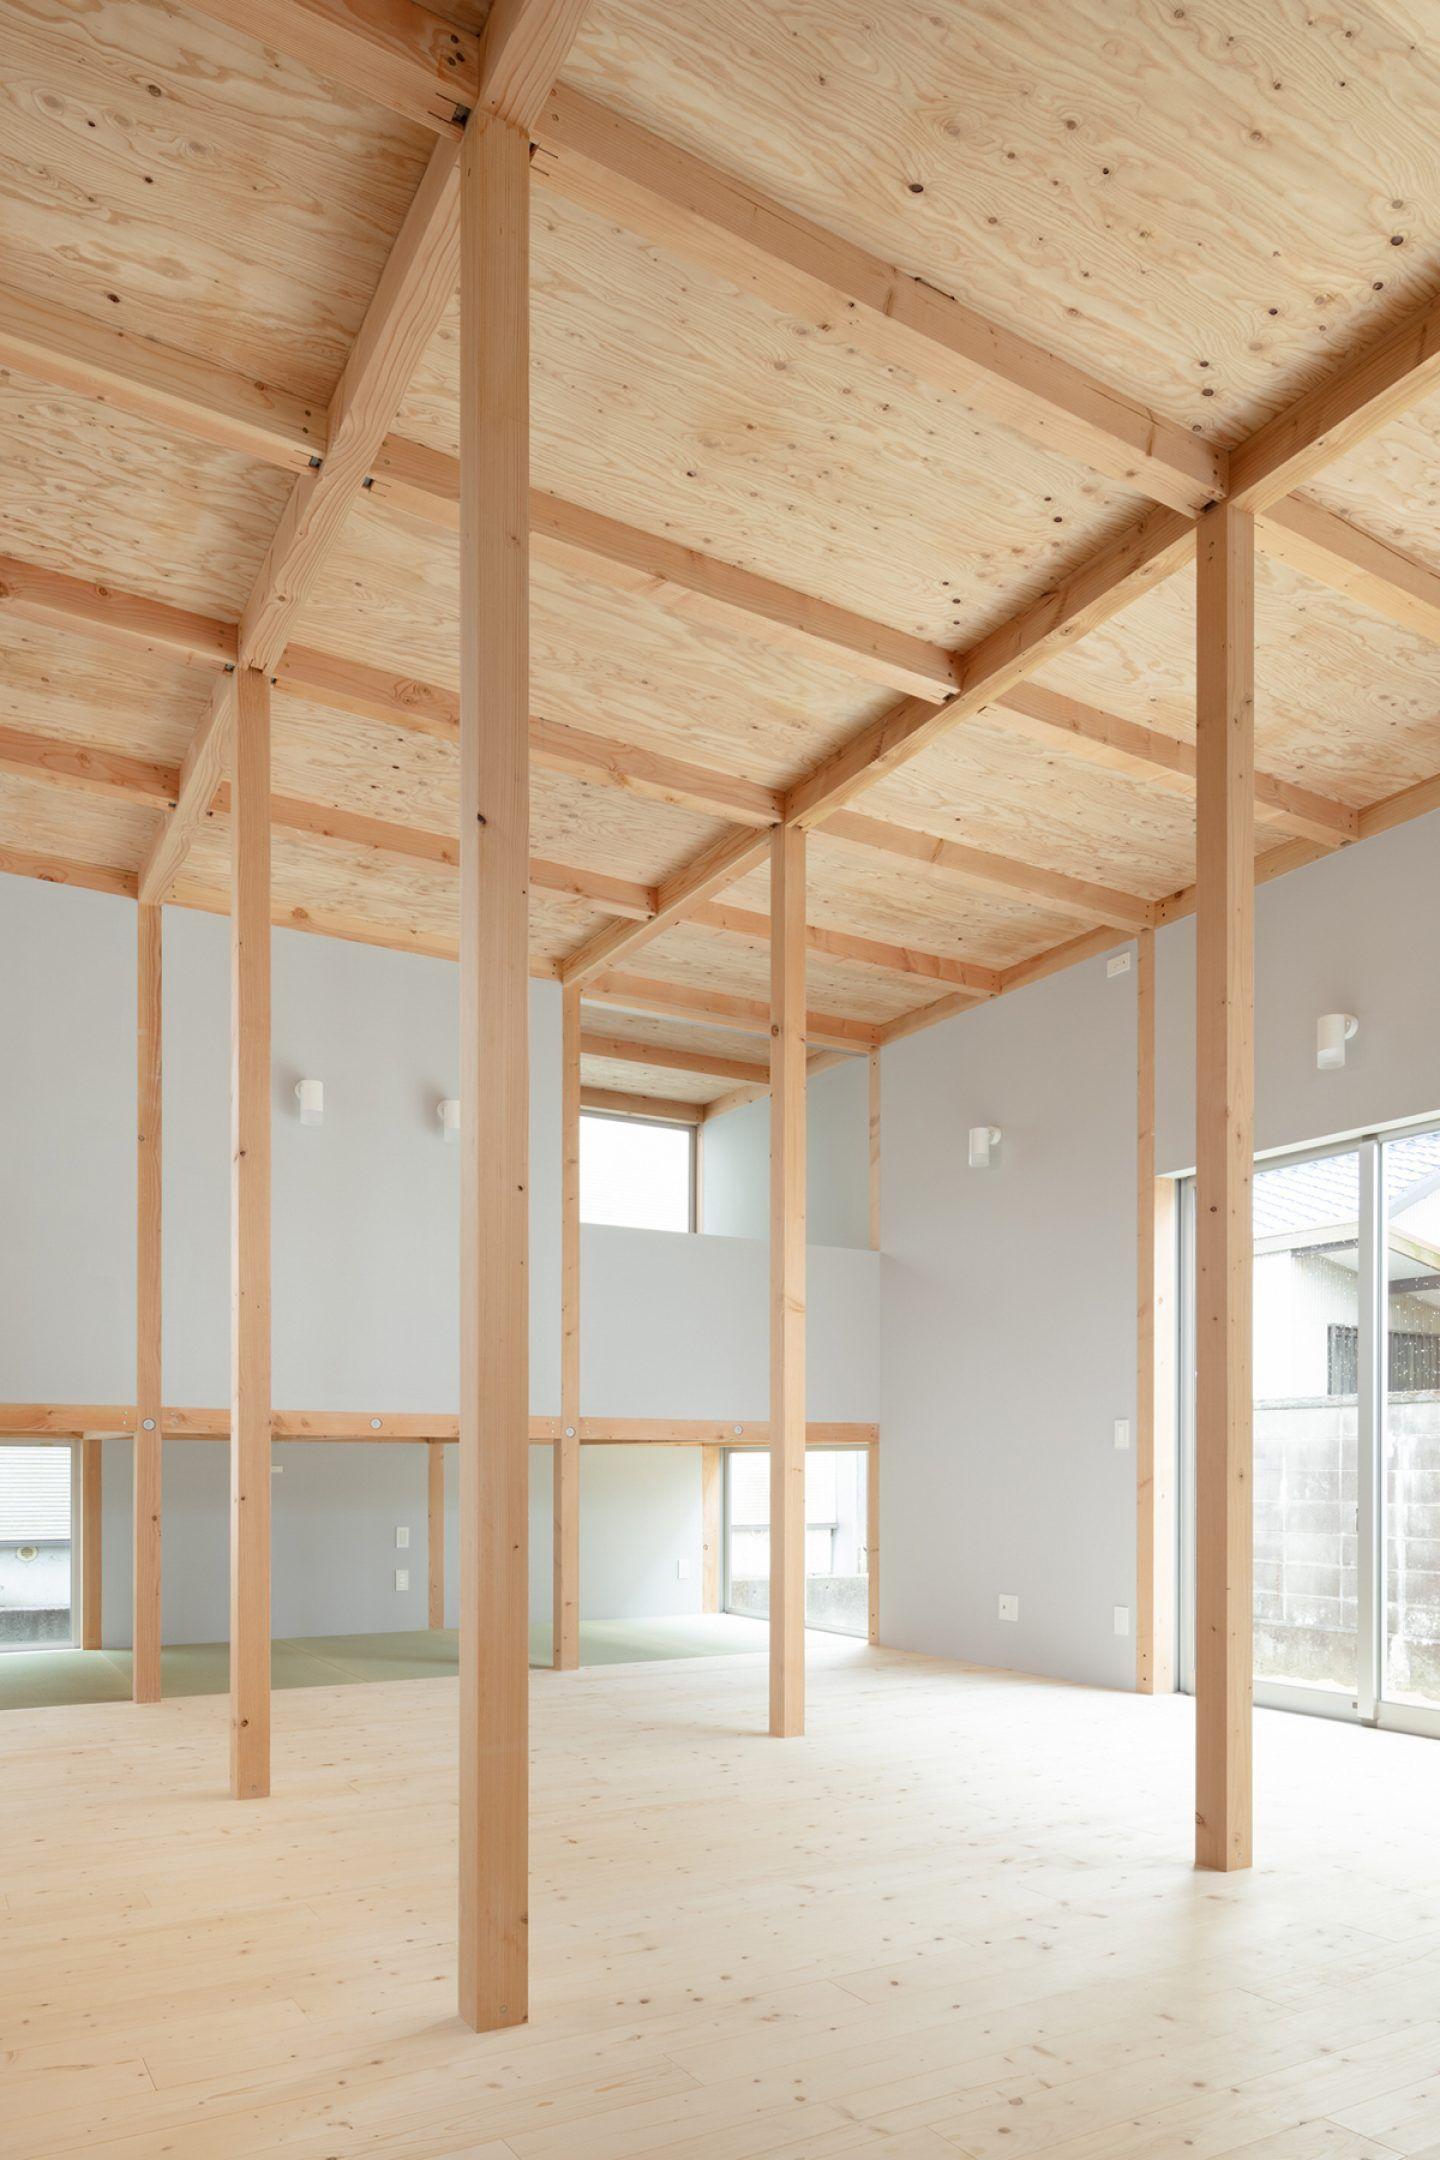 IGNANT-Architecture-Naoya-Kitamura-Koda-Townhouse-13